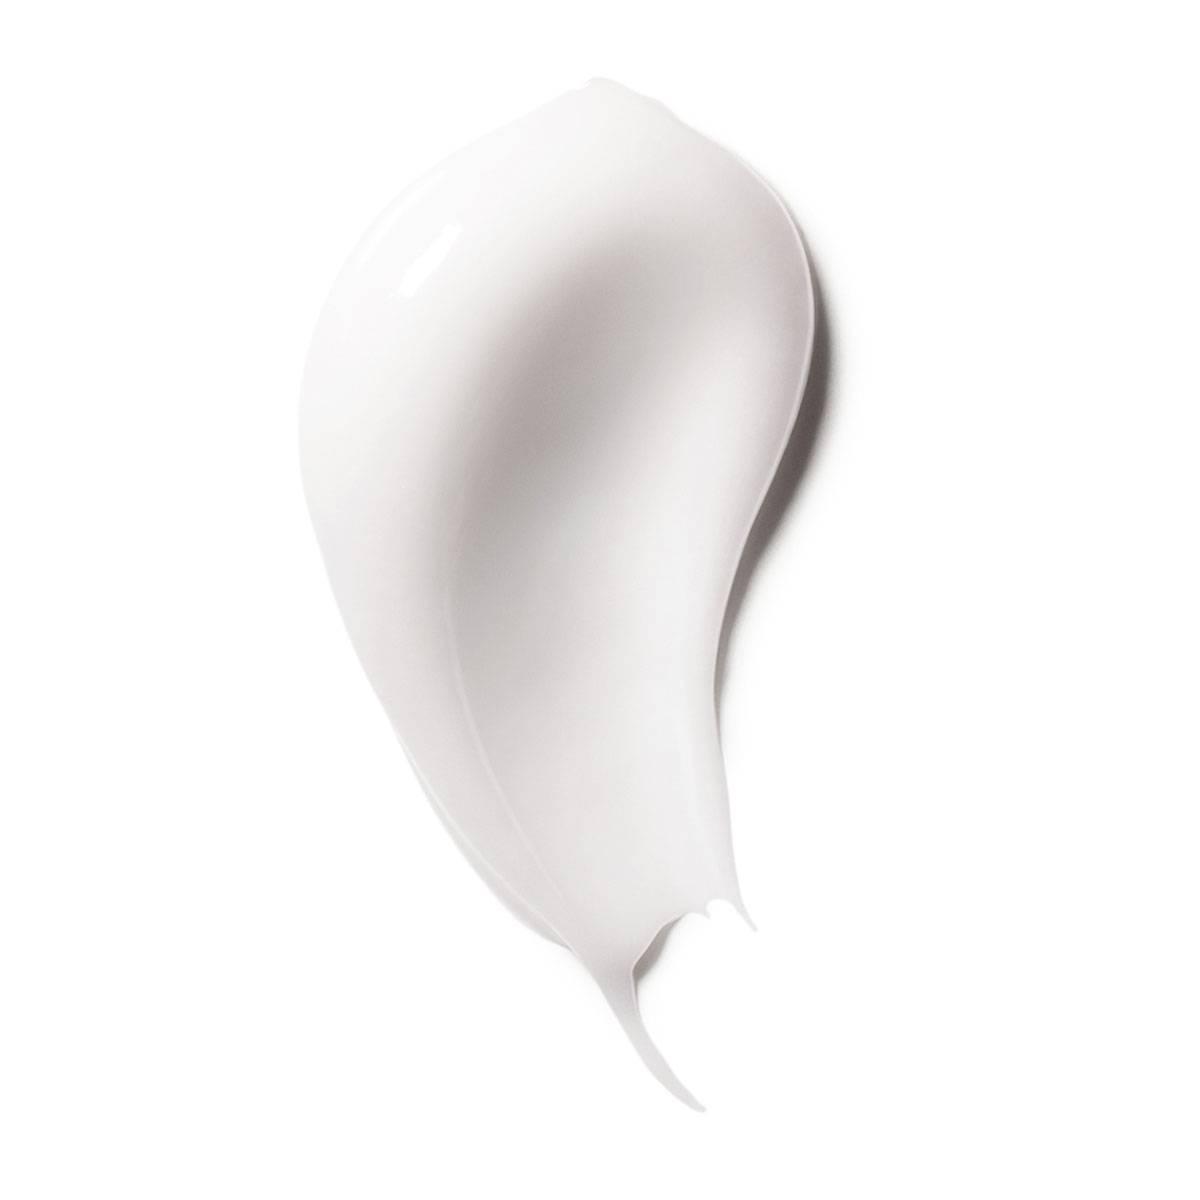 La Roche Posay ProduktSide Hydraphase Let Tekstur